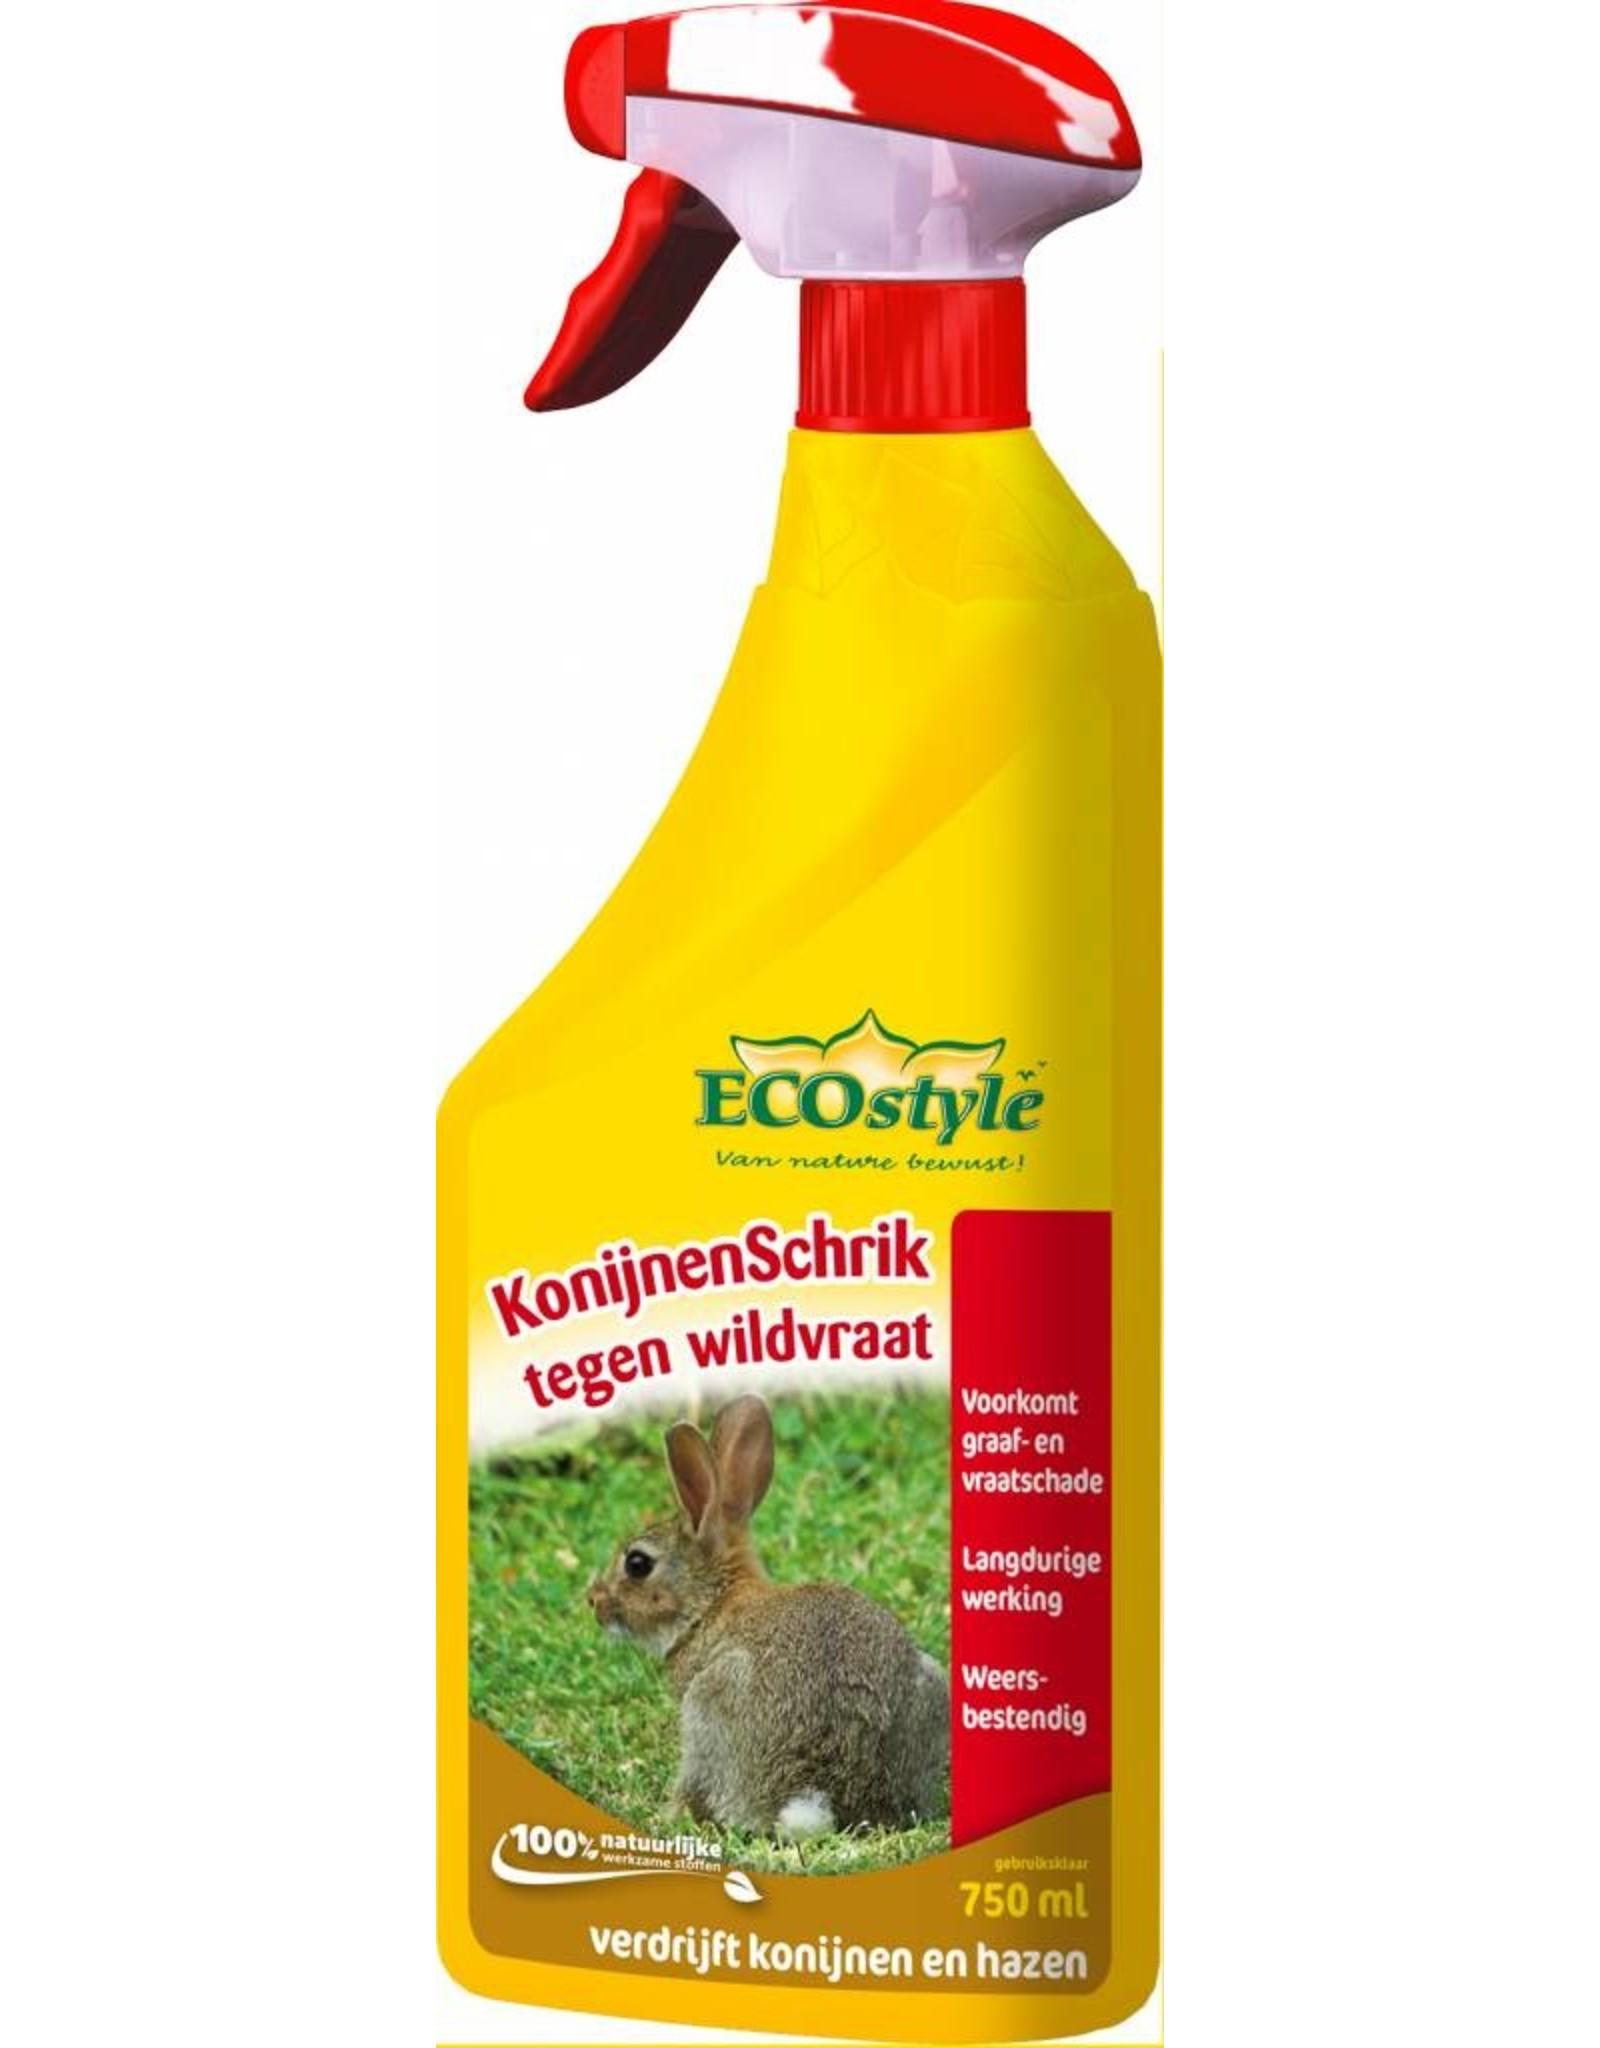 Ecostyle KonijnenSchrik 750 ml